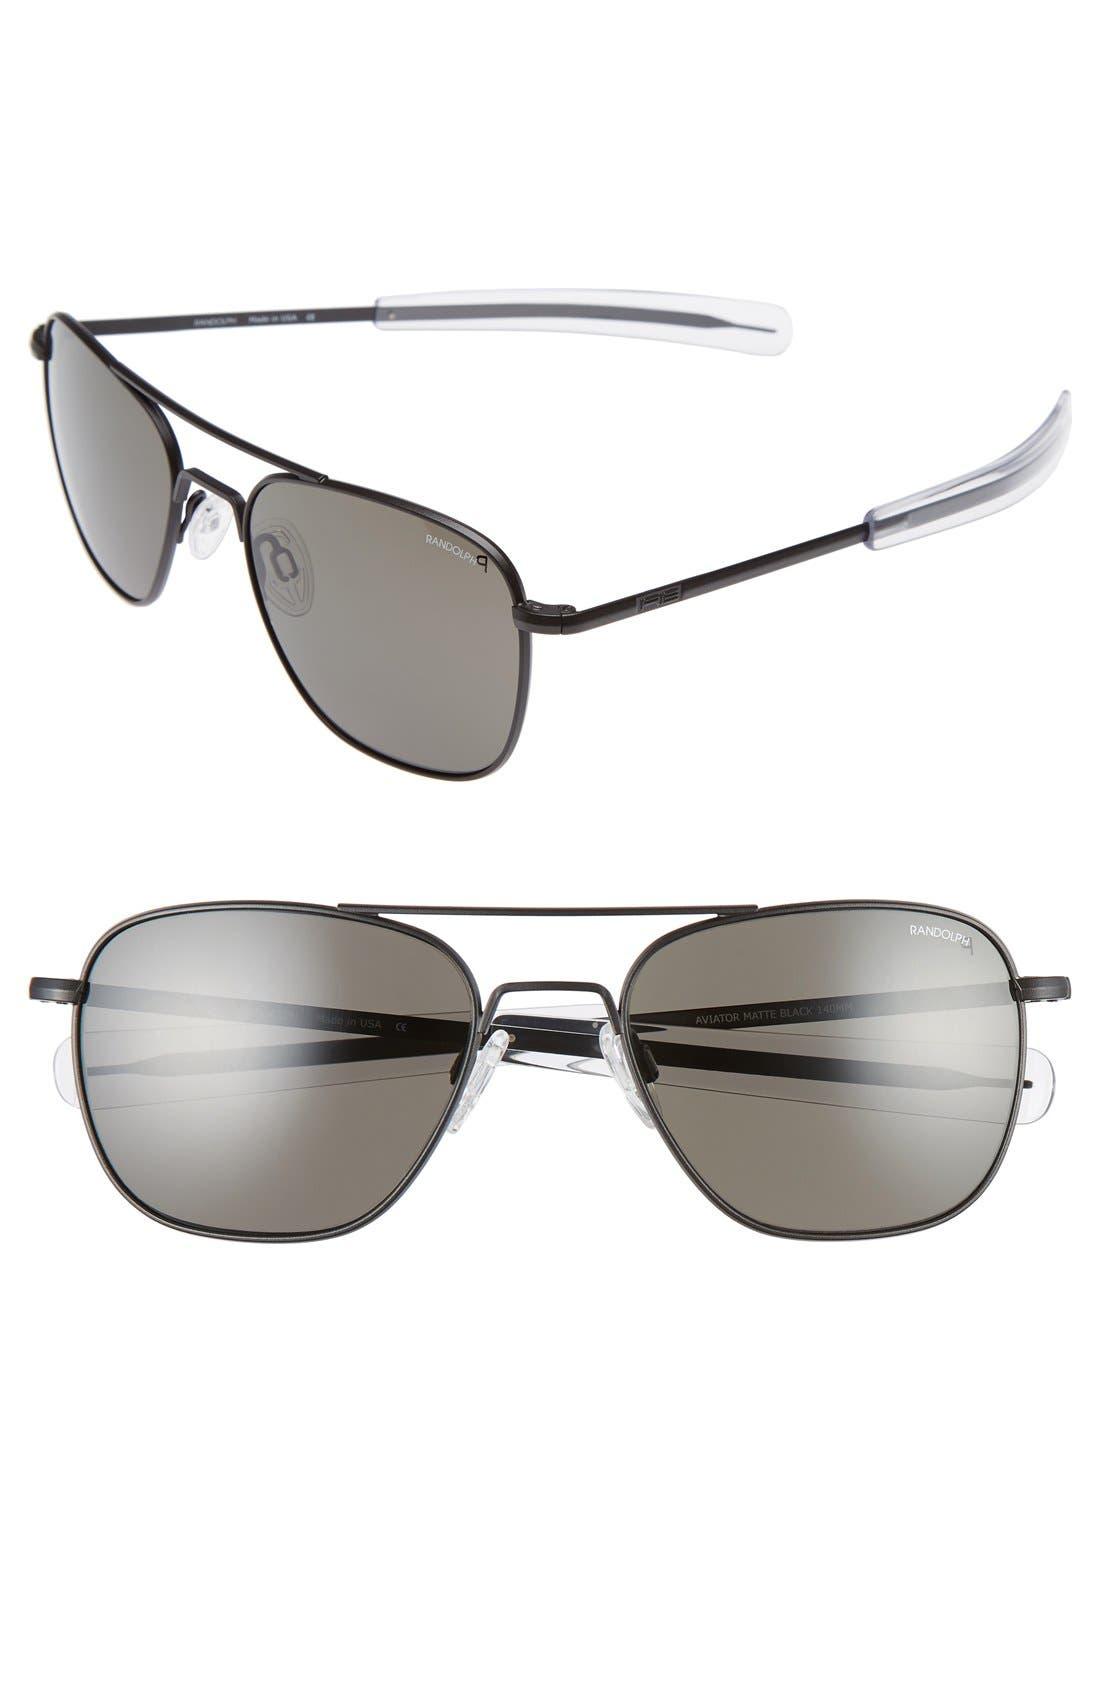 55mm Polarized Aviator Sunglasses,                             Main thumbnail 1, color,                             001